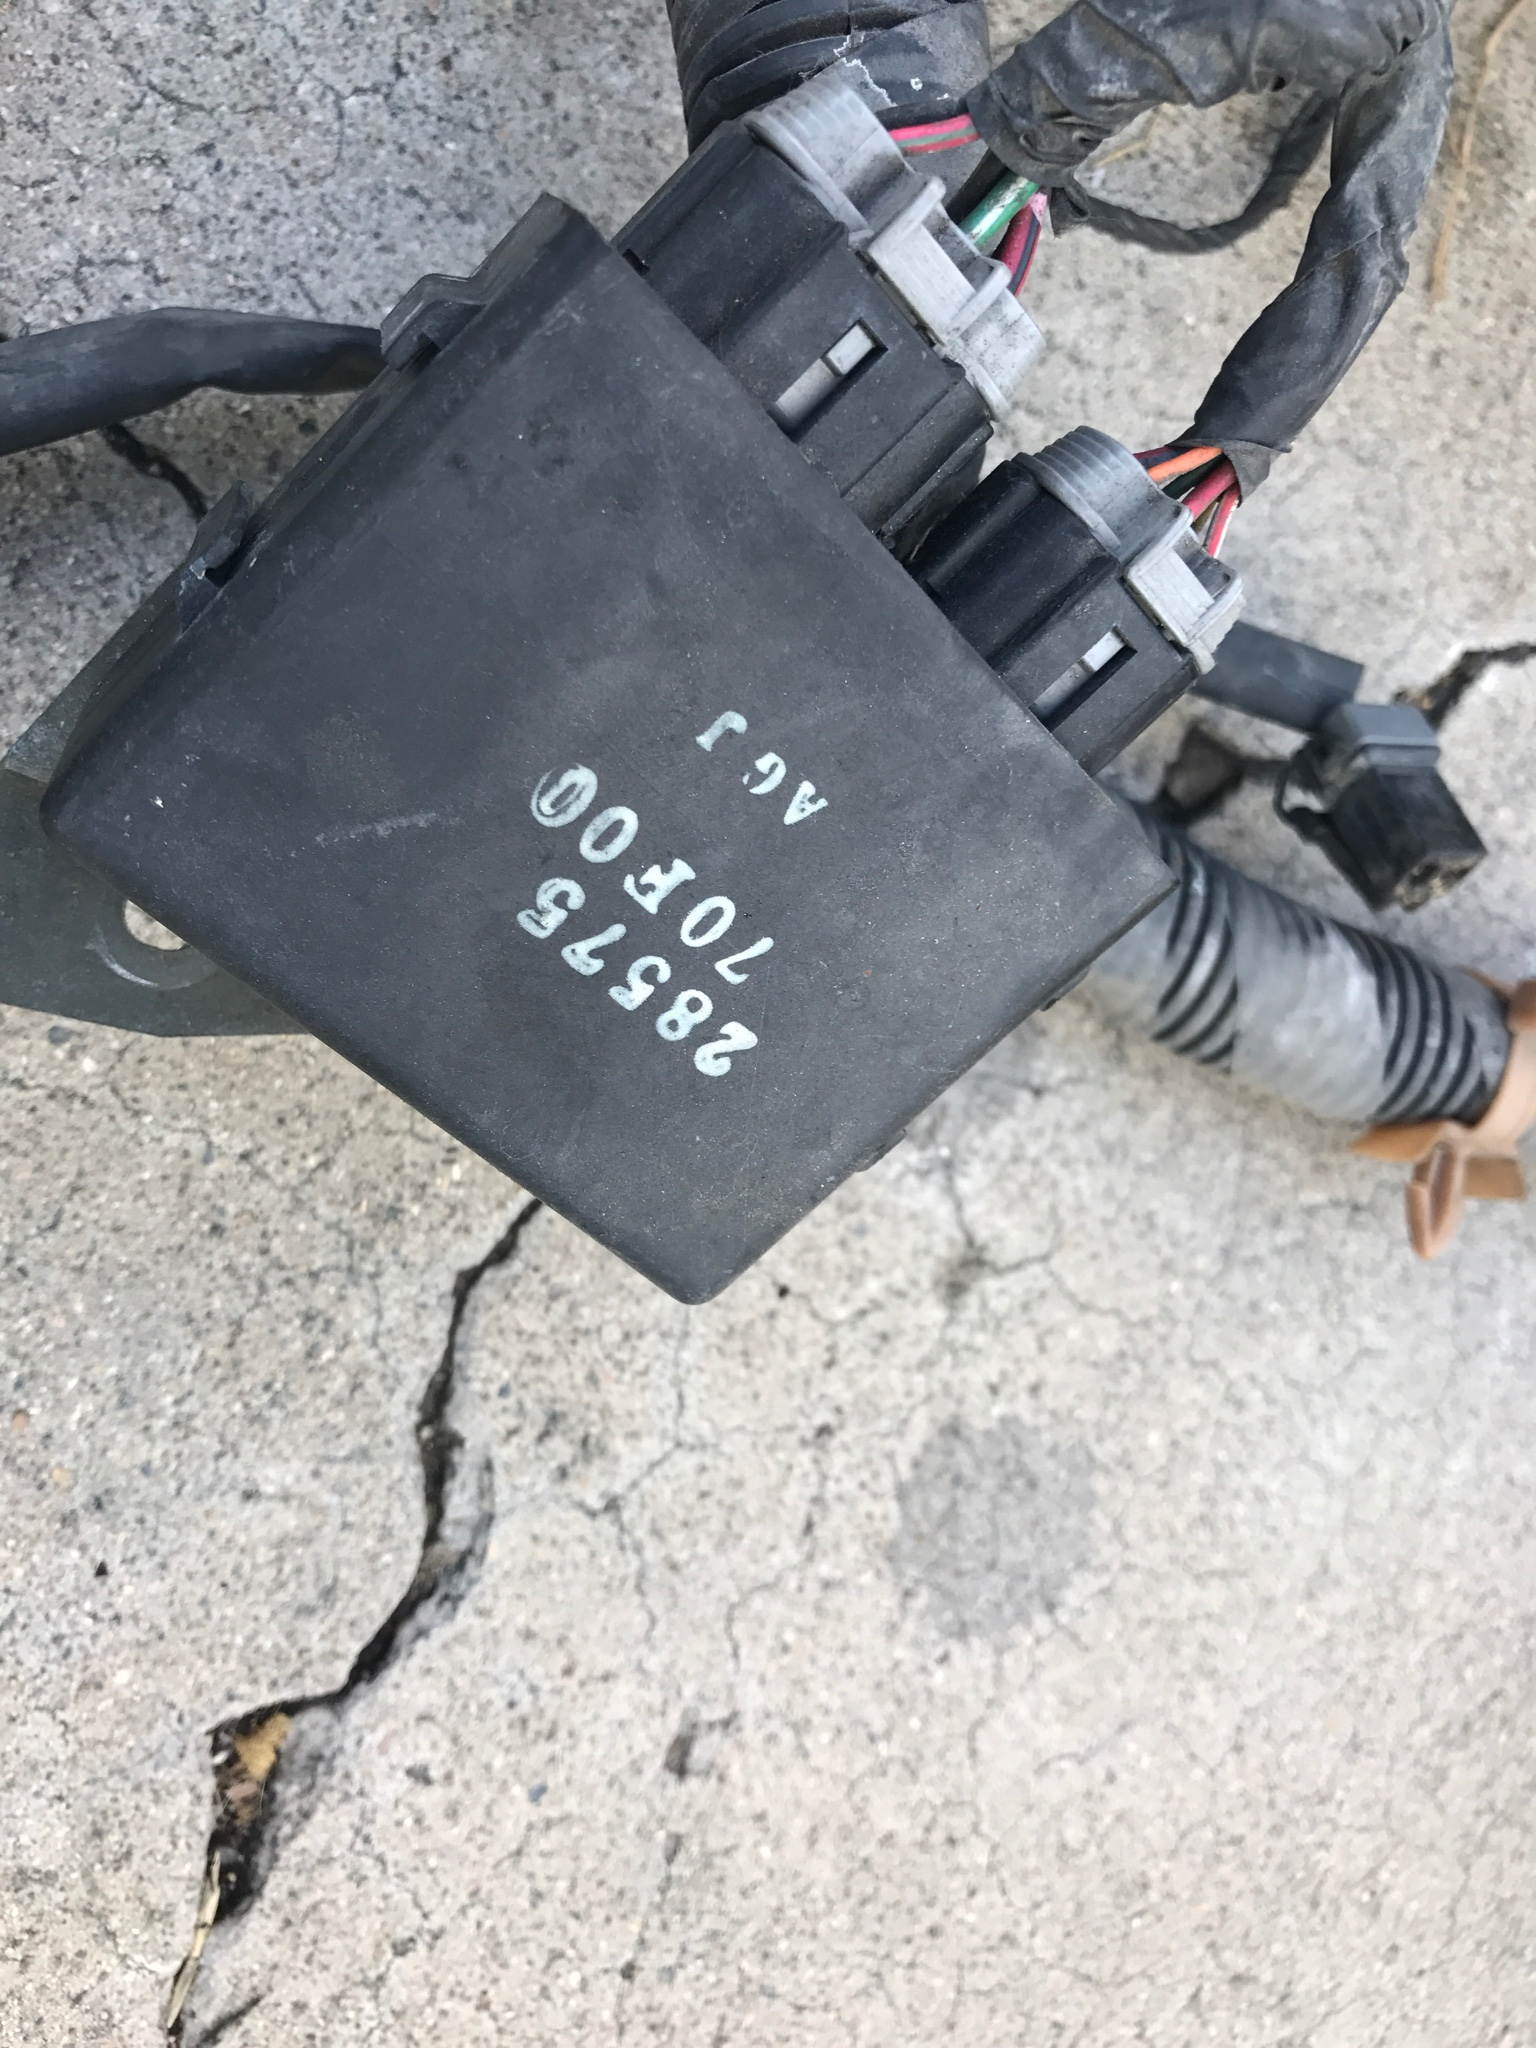 80dcdd52b29b5383a403ff74e9139dc4 S Fuse Box For Sale on 2006 nissan maxima fuse box, vanagon fuse box, 300zx fuse box, m2 fuse box, automotive fuse box, ae86 fuse box, old fuse box, b4 fuse box, e36 fuse box, marine fuse box, ac fuse box, motorcycle fuse box, c5 fuse box, c3 fuse box, race car fuse box, 2006 altima fuse box, bussmann fuse box, 2010 accord fuse box, c4 fuse box, h3 fuse box,